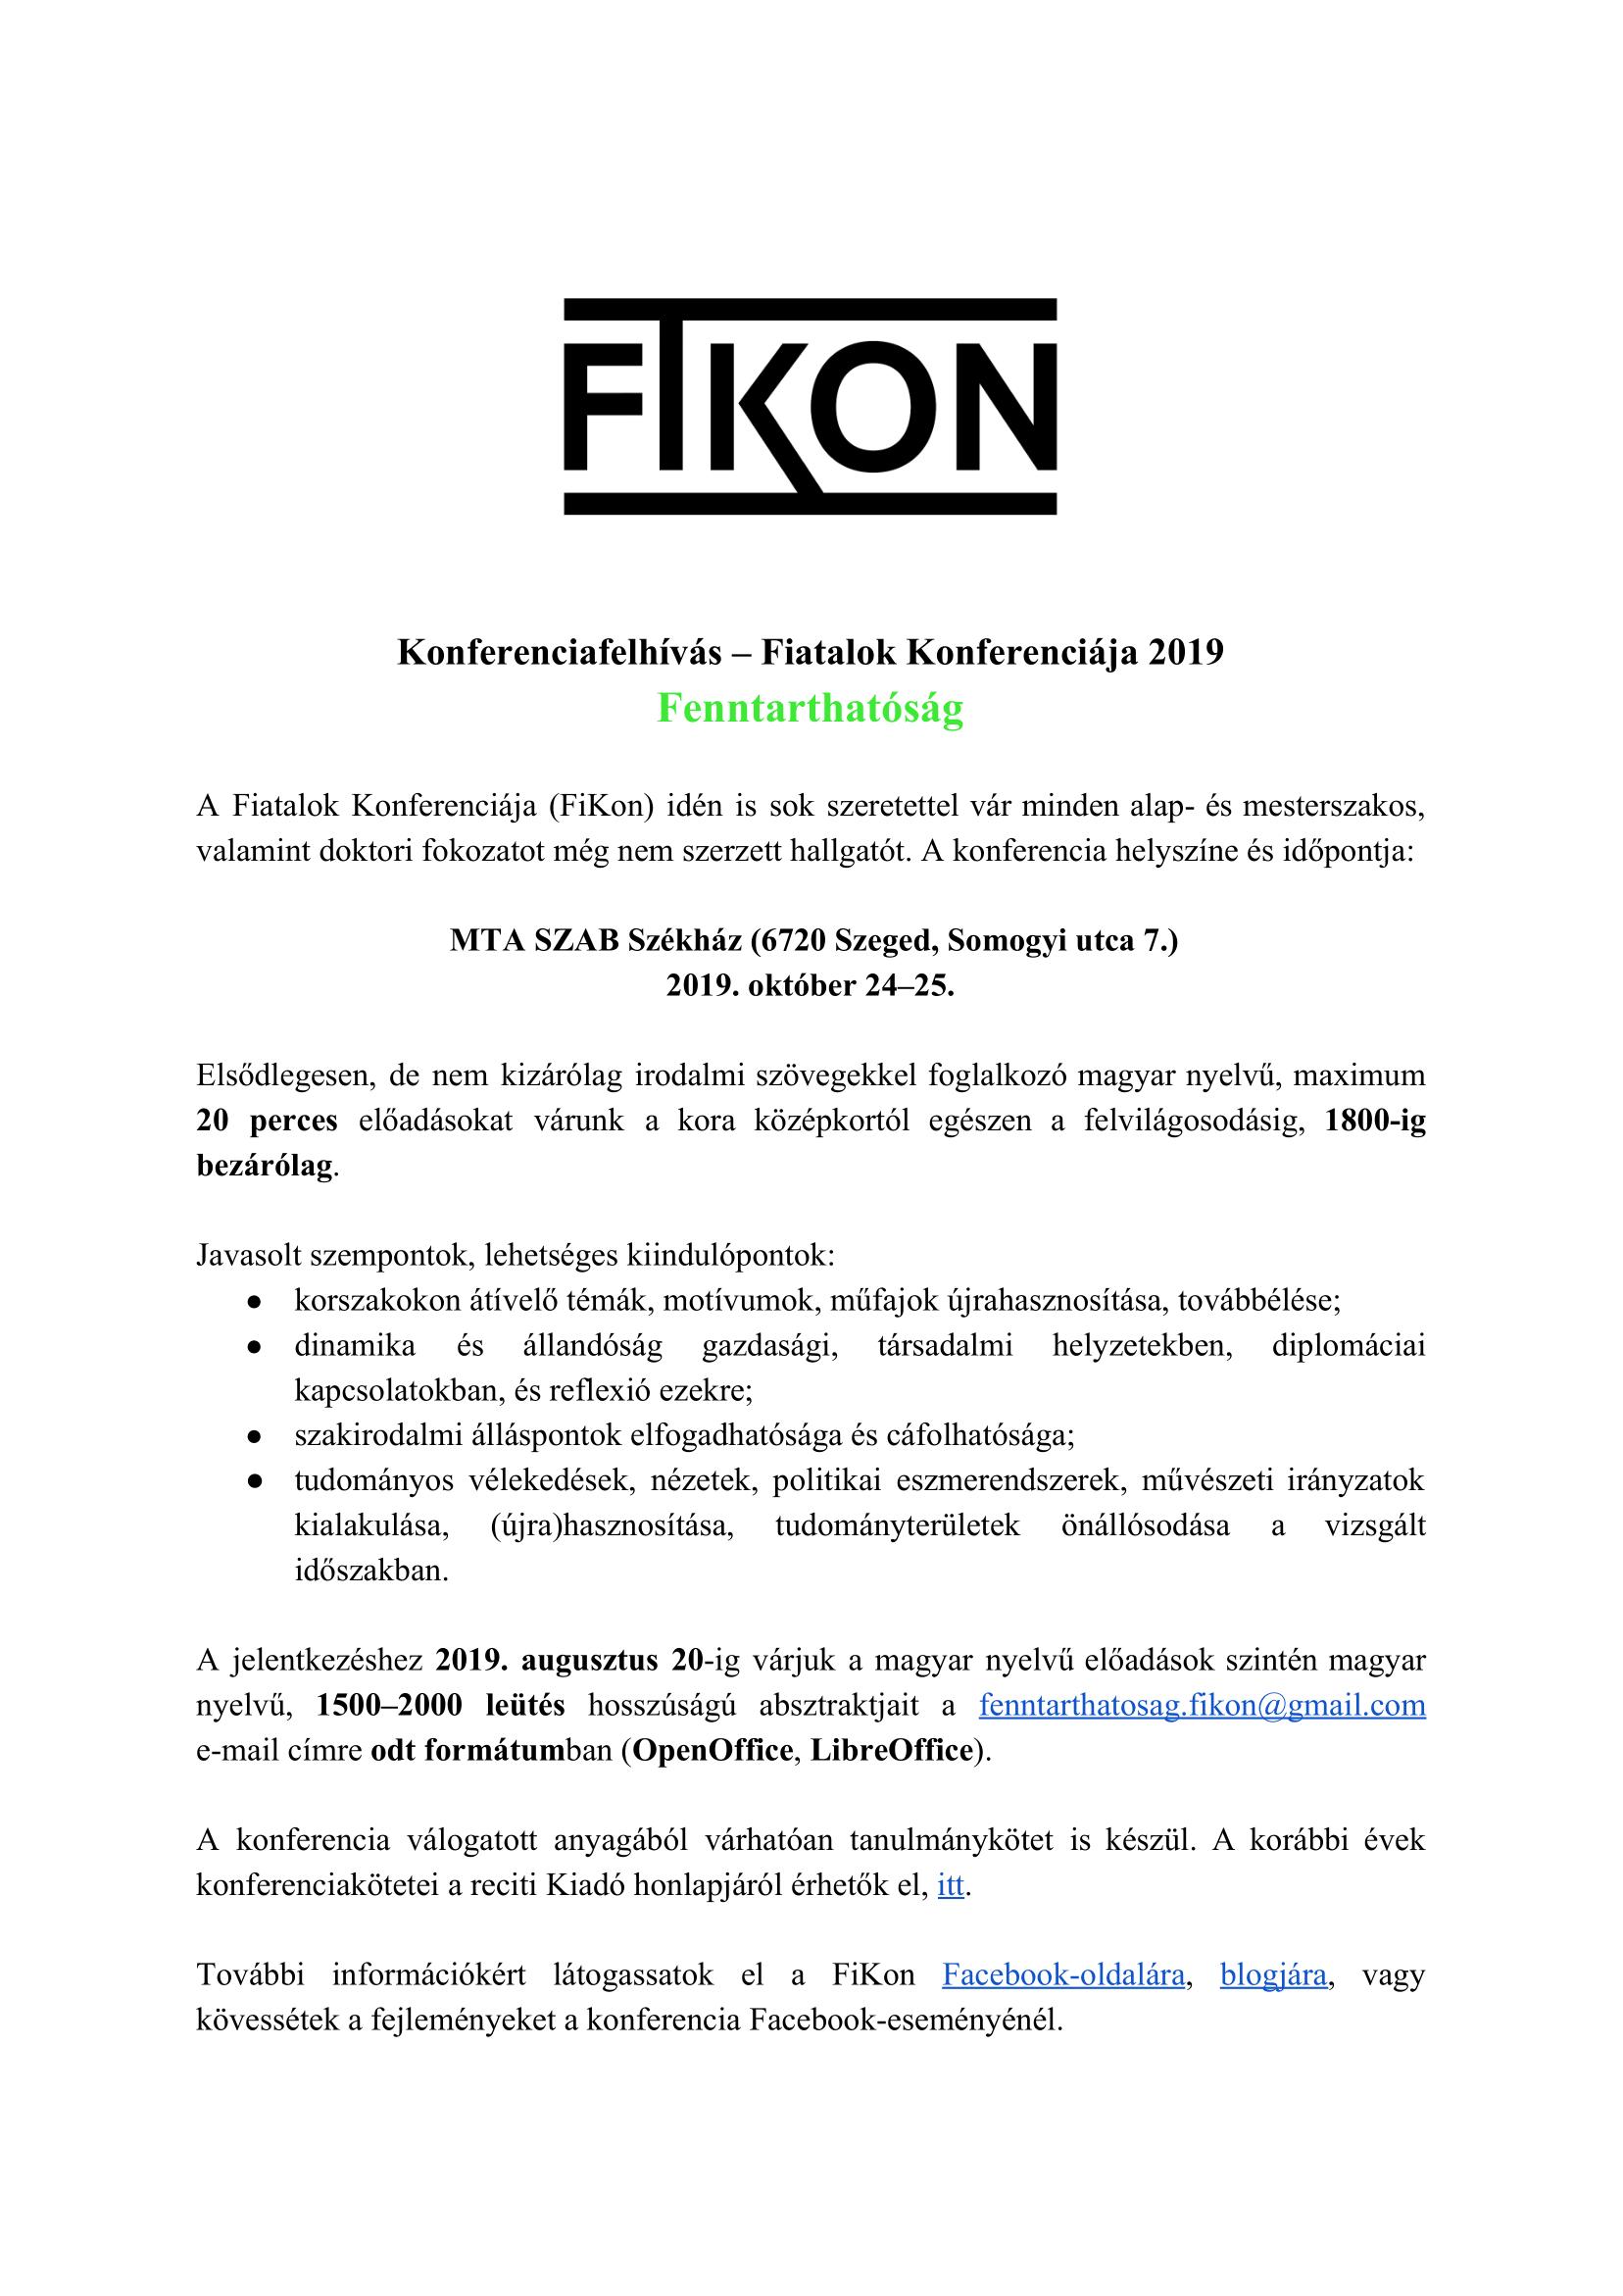 fikon2019-1.png